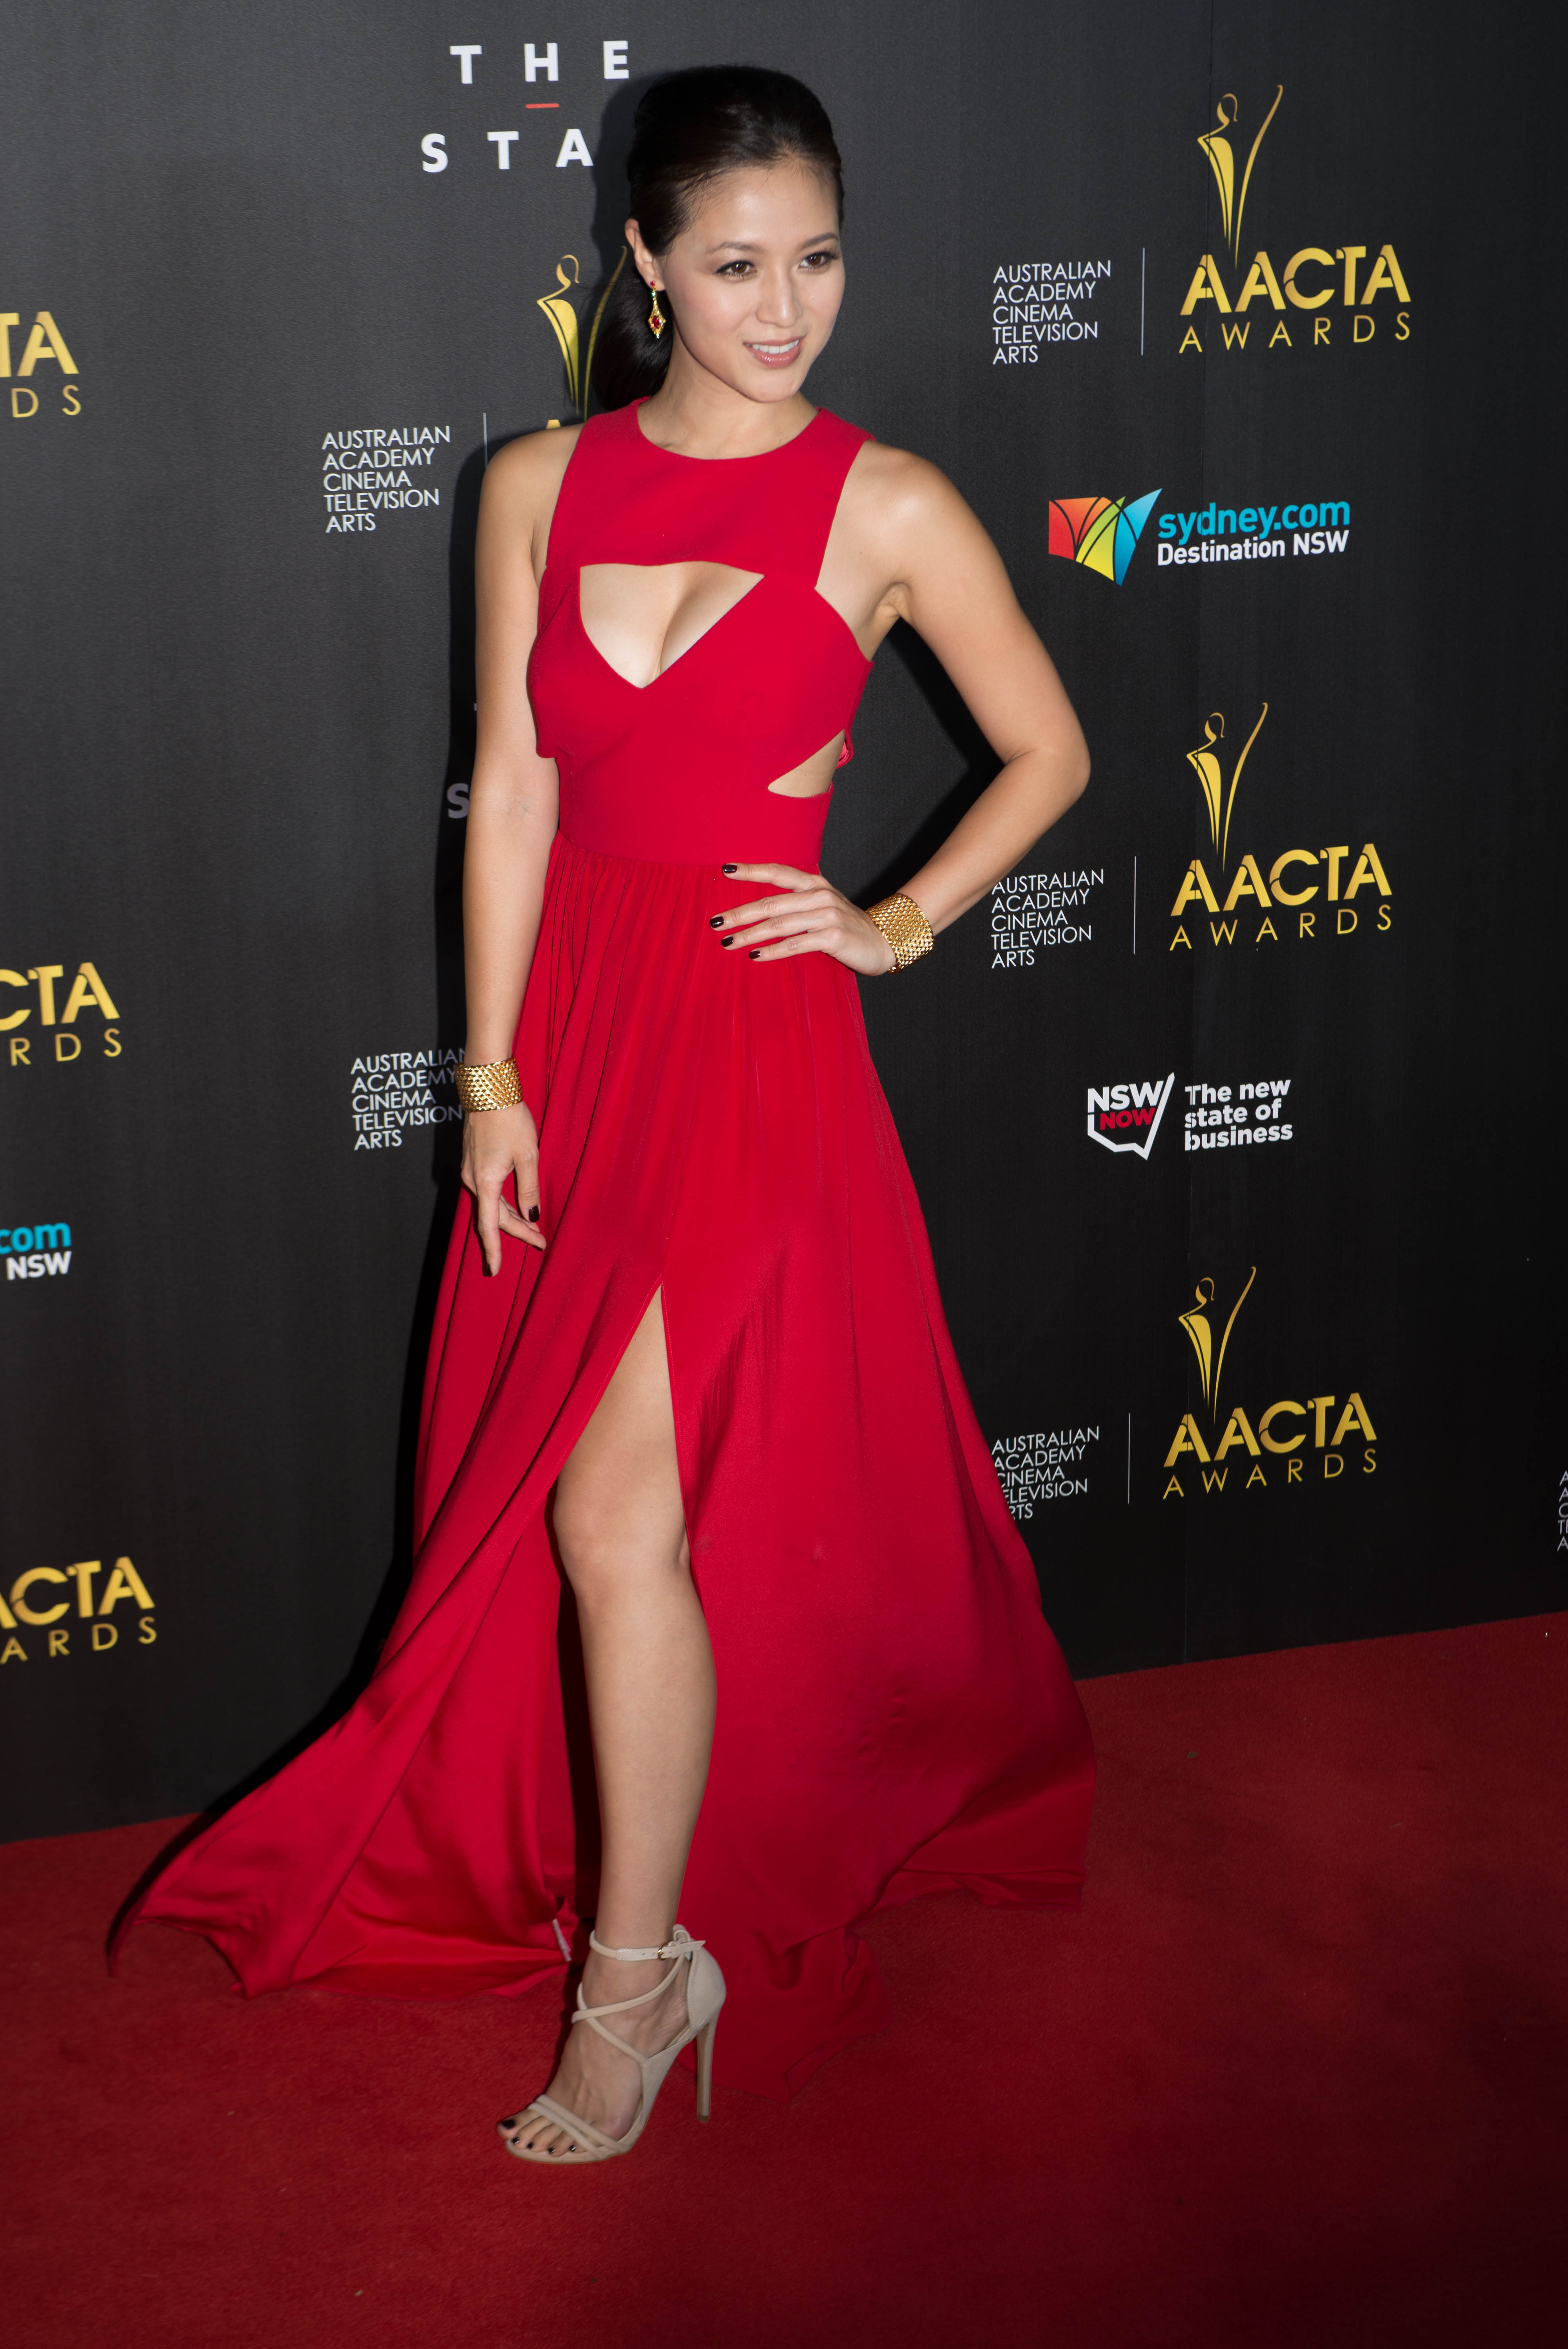 aacta awards - photo #42